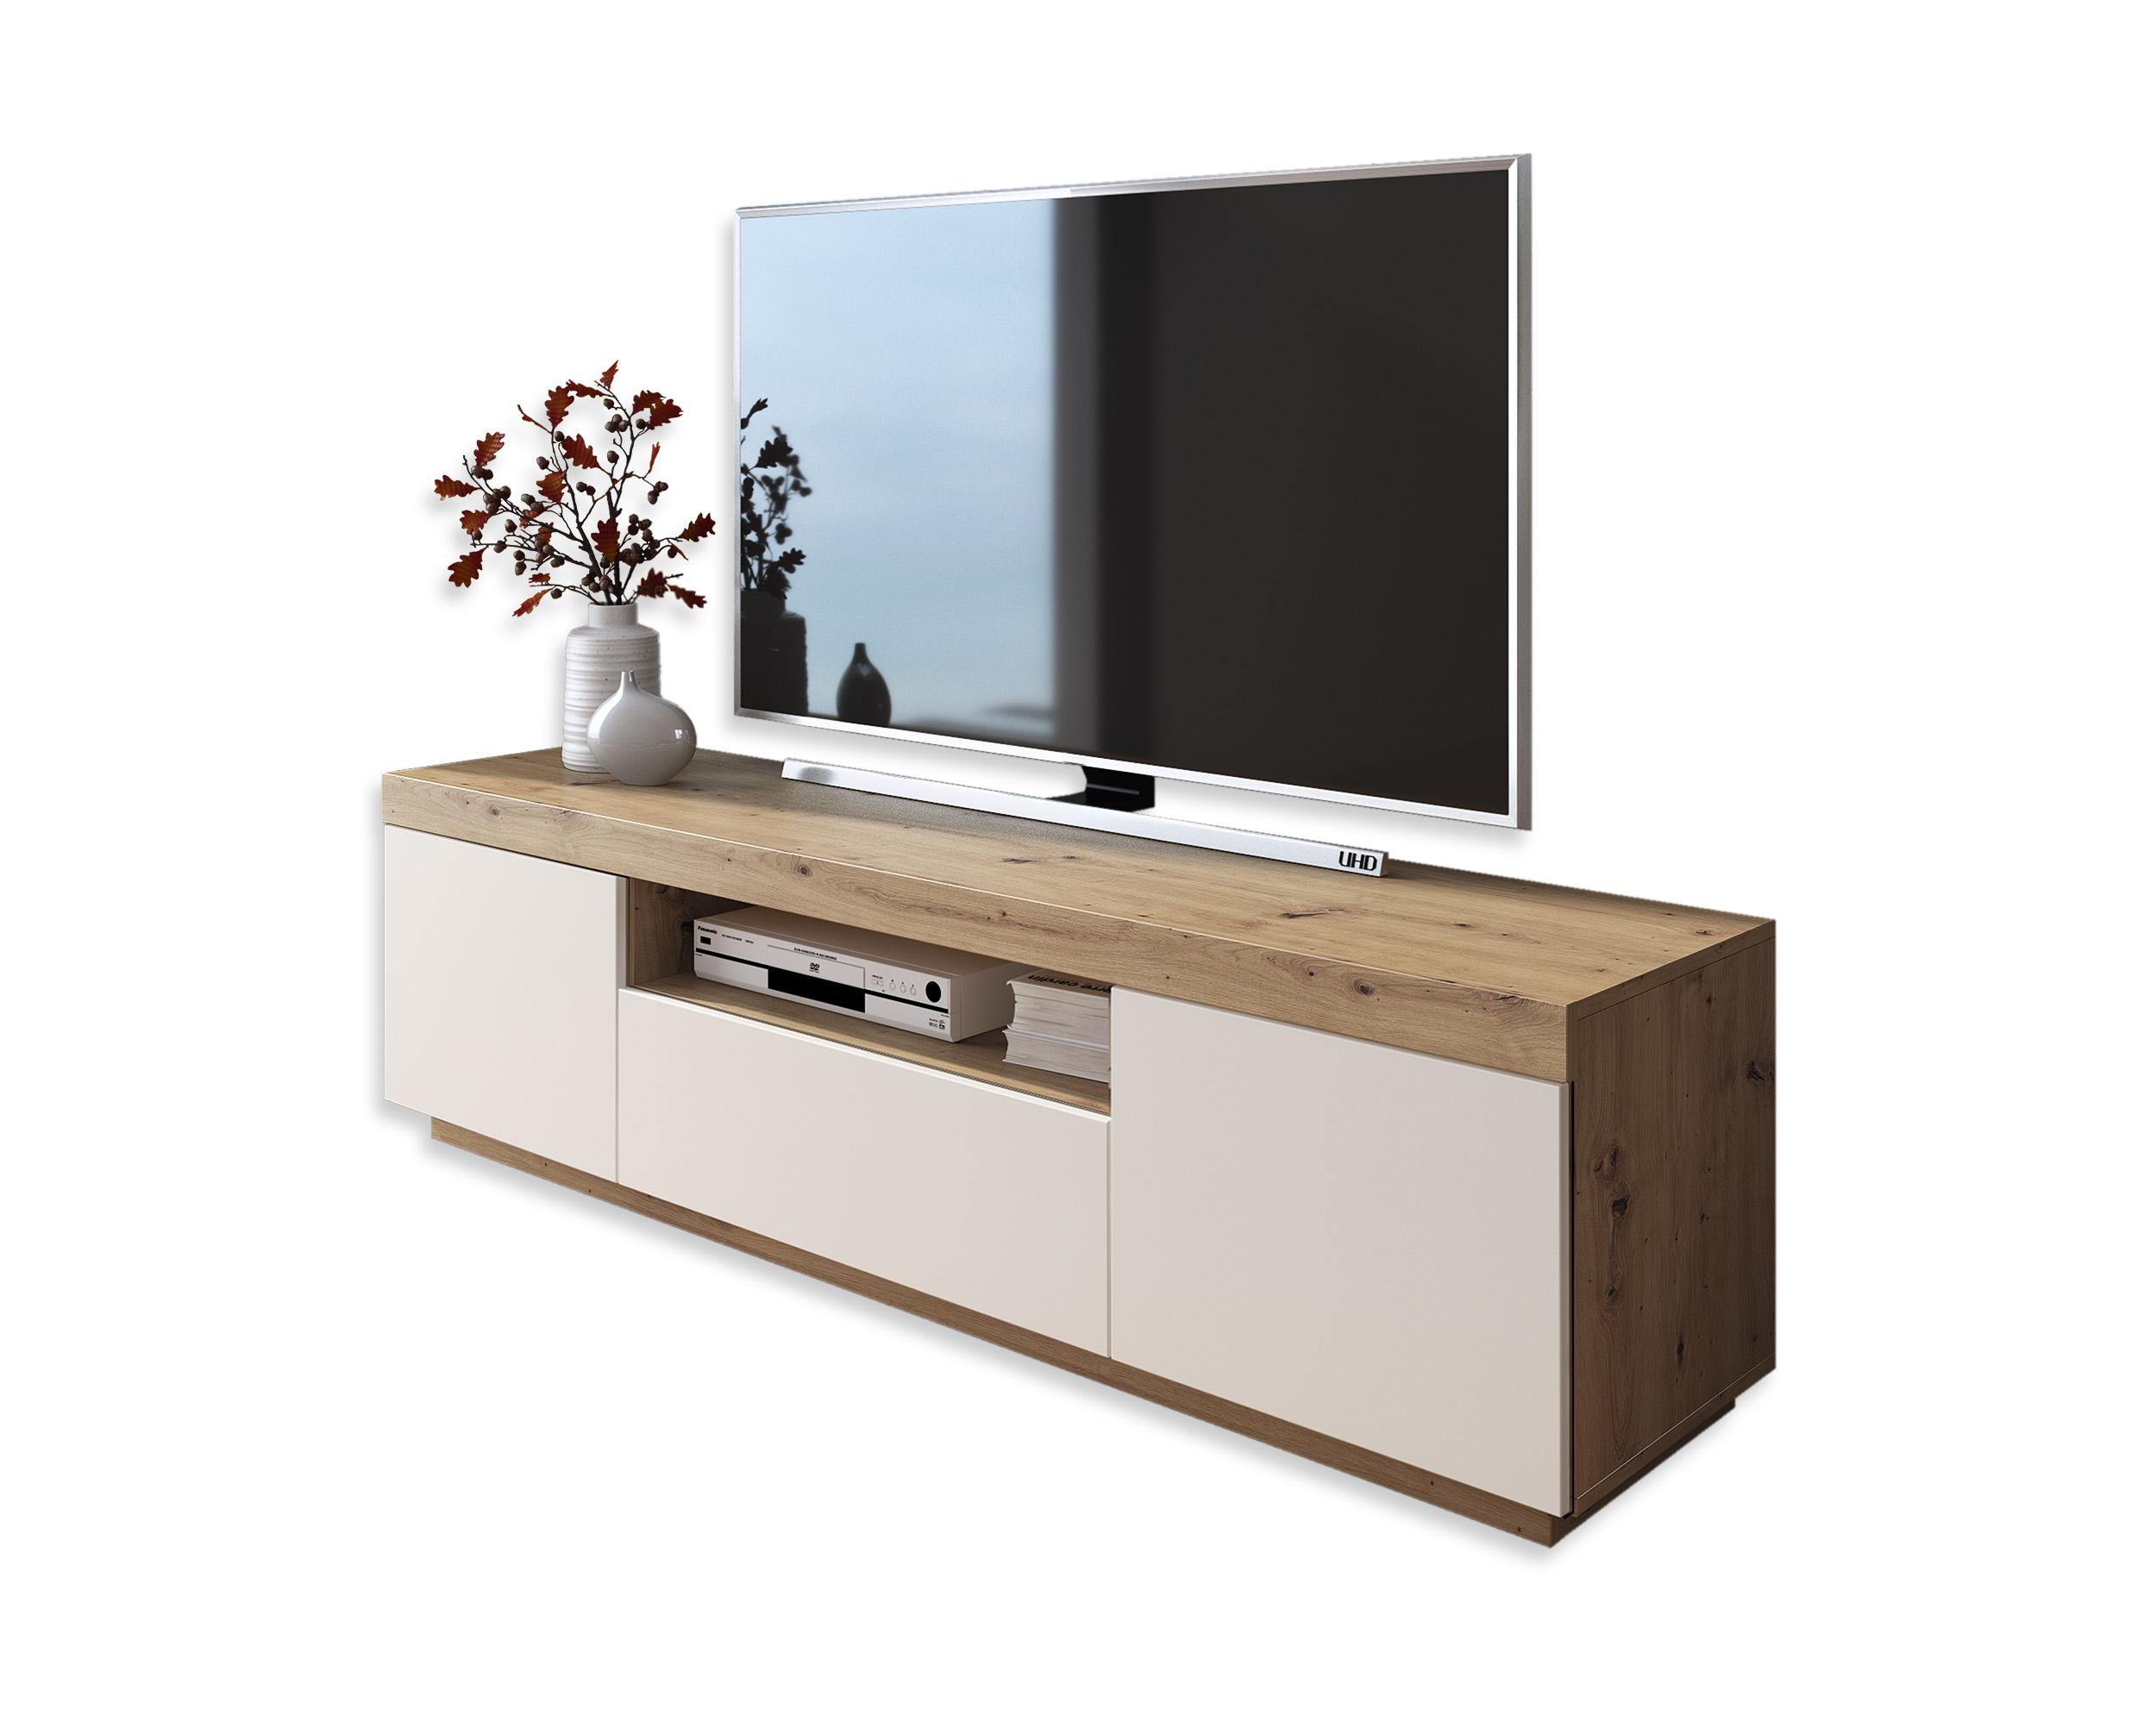 Szafka RTV stolik TV YOSHI wotan biały mat 170 cm